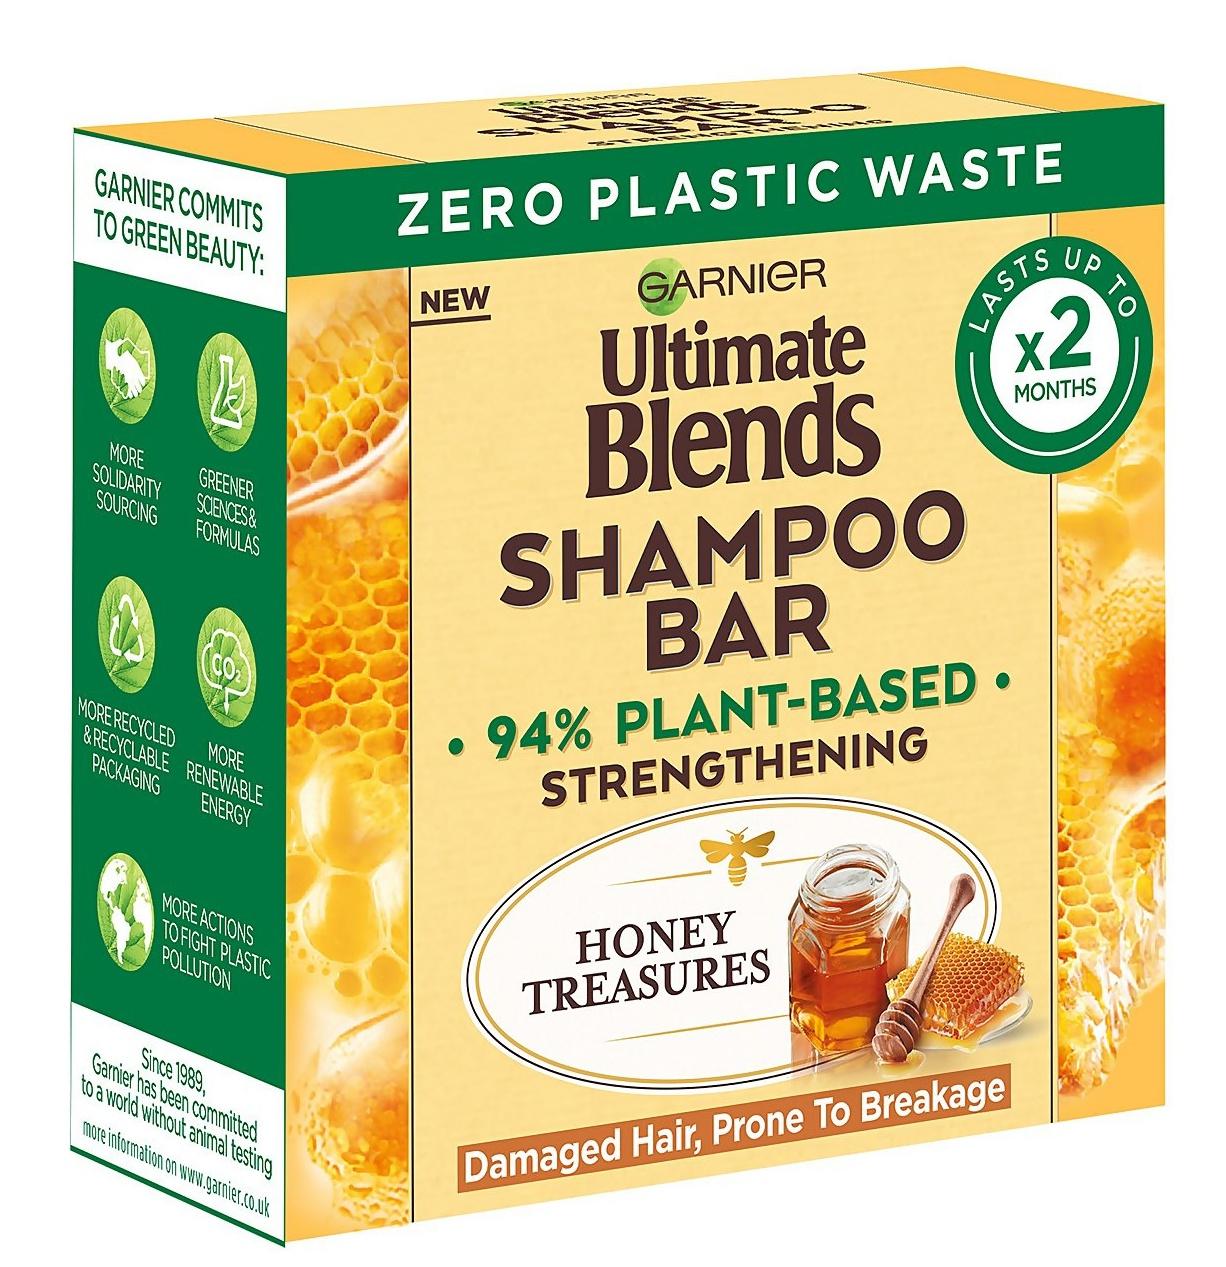 Garnier Ultimate Blends Honey Treasures Shampoo Bar